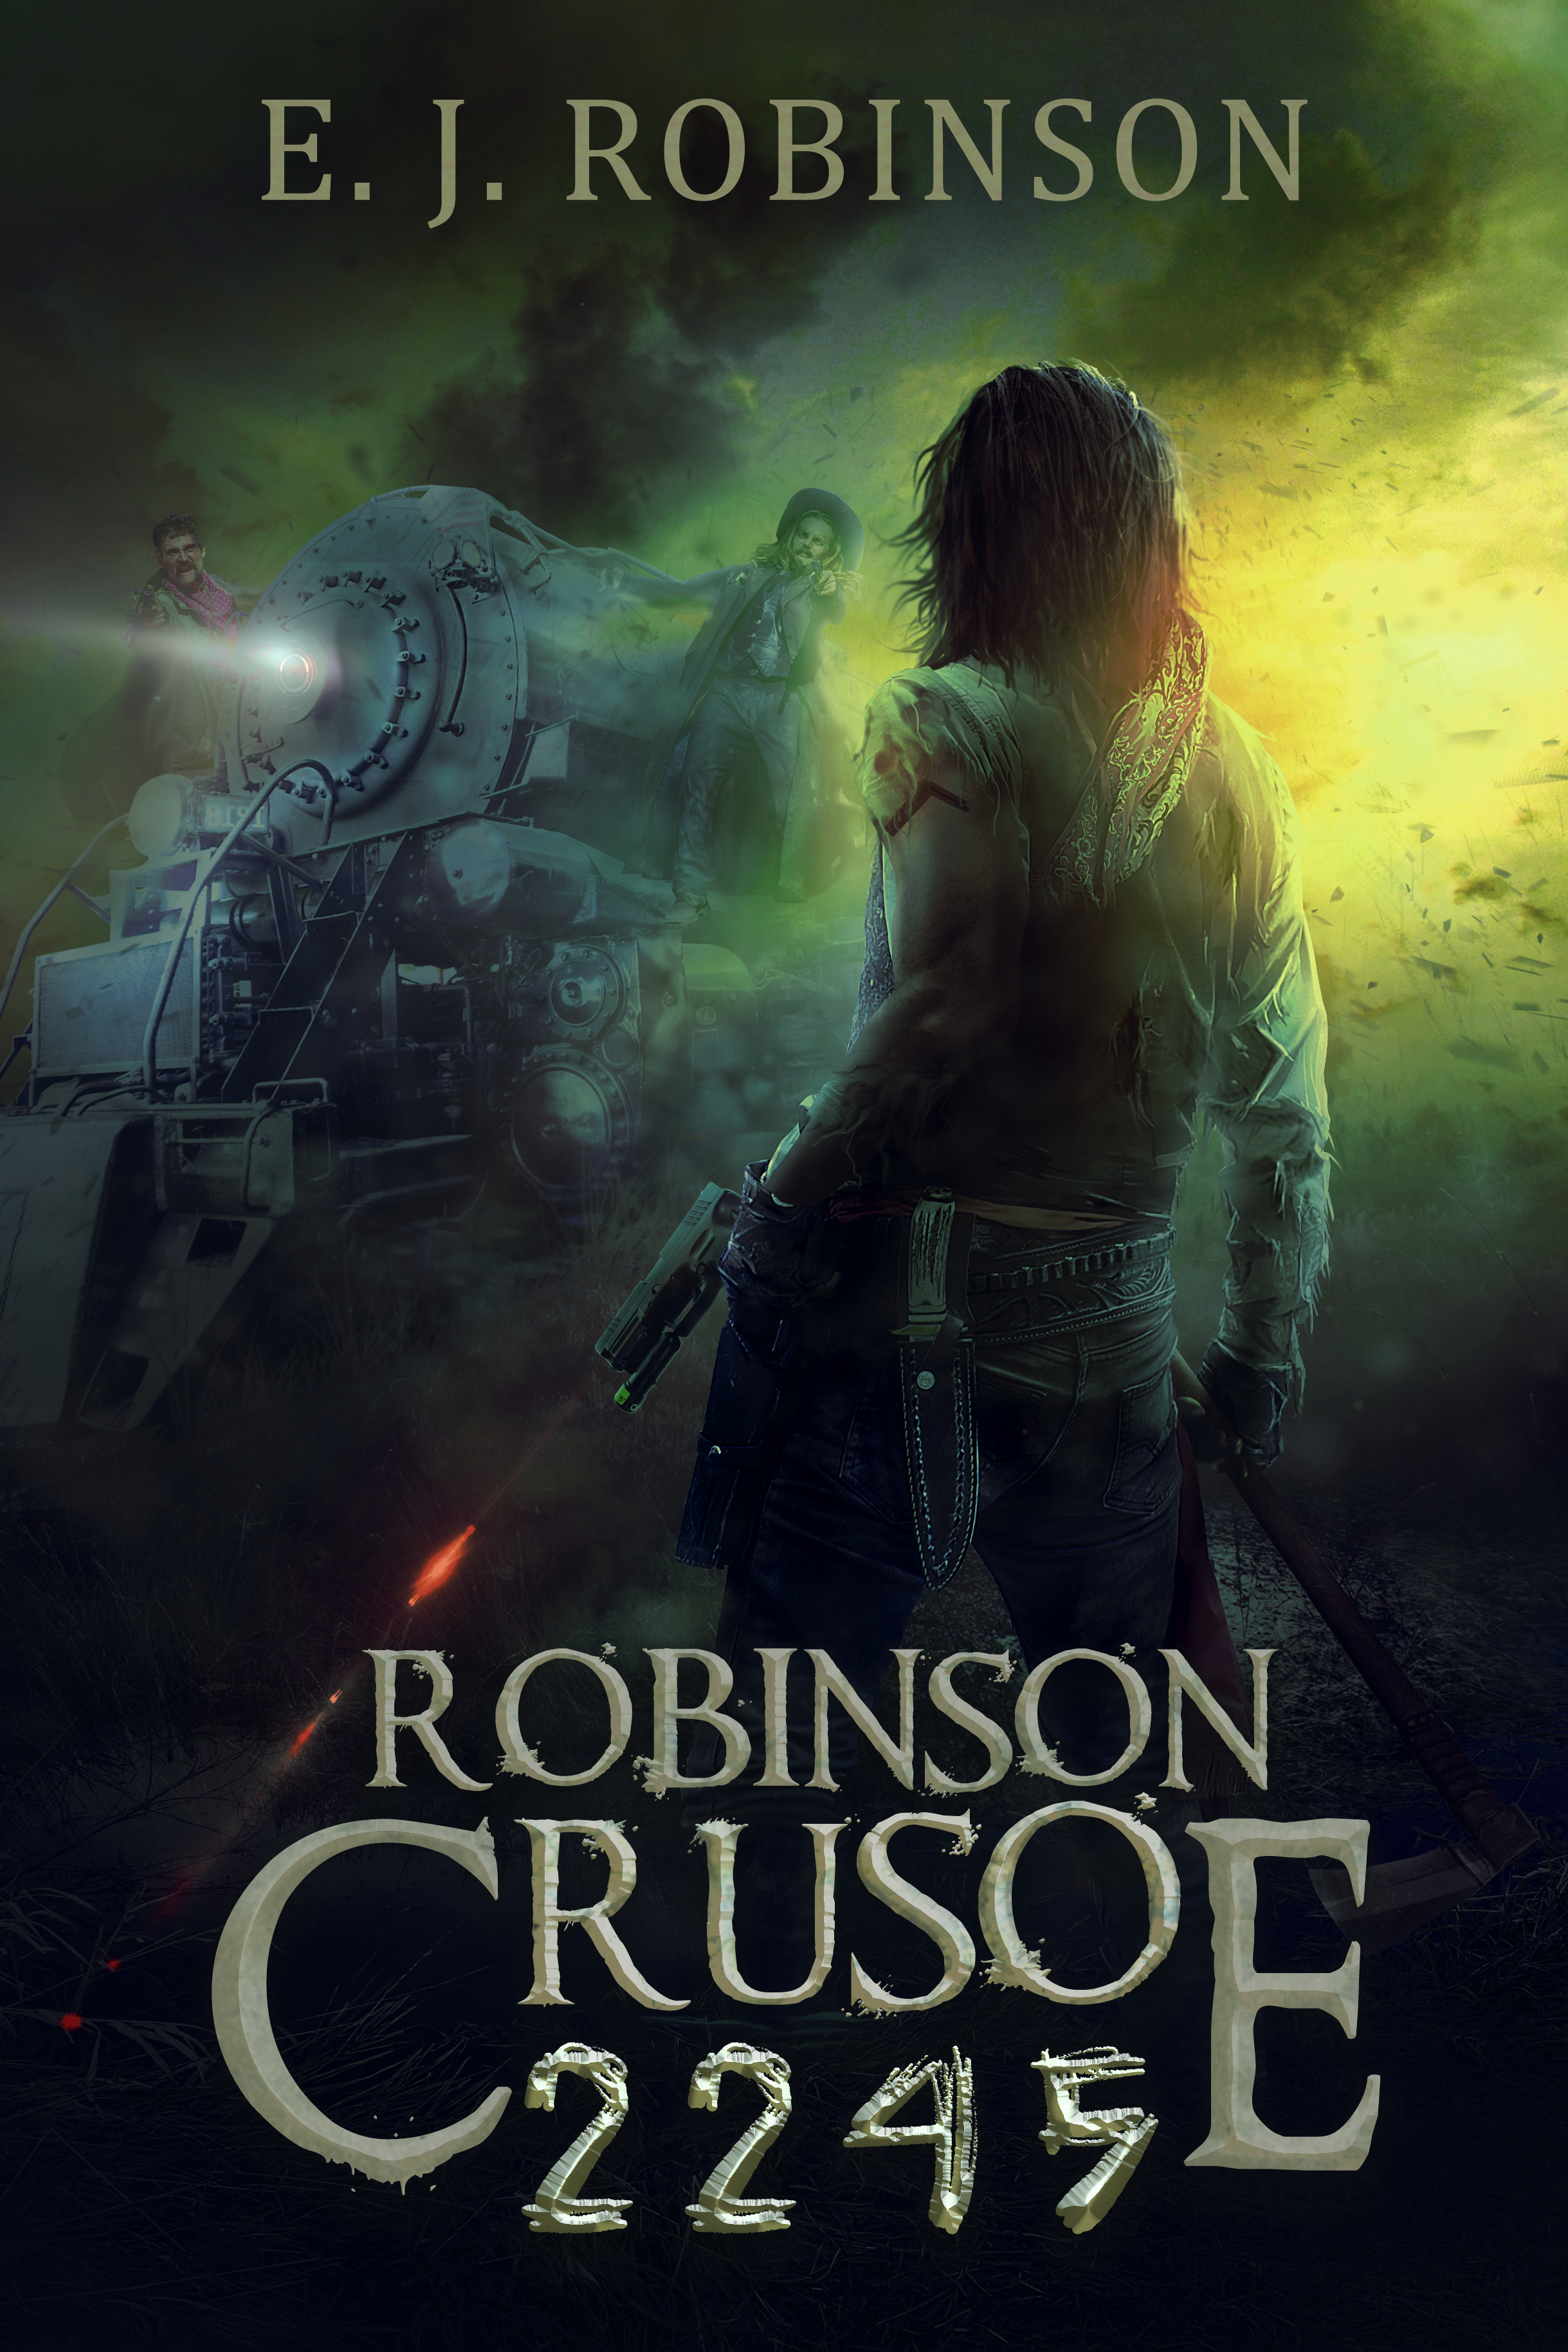 Robinson Crusoe 2245 front cover.jpg